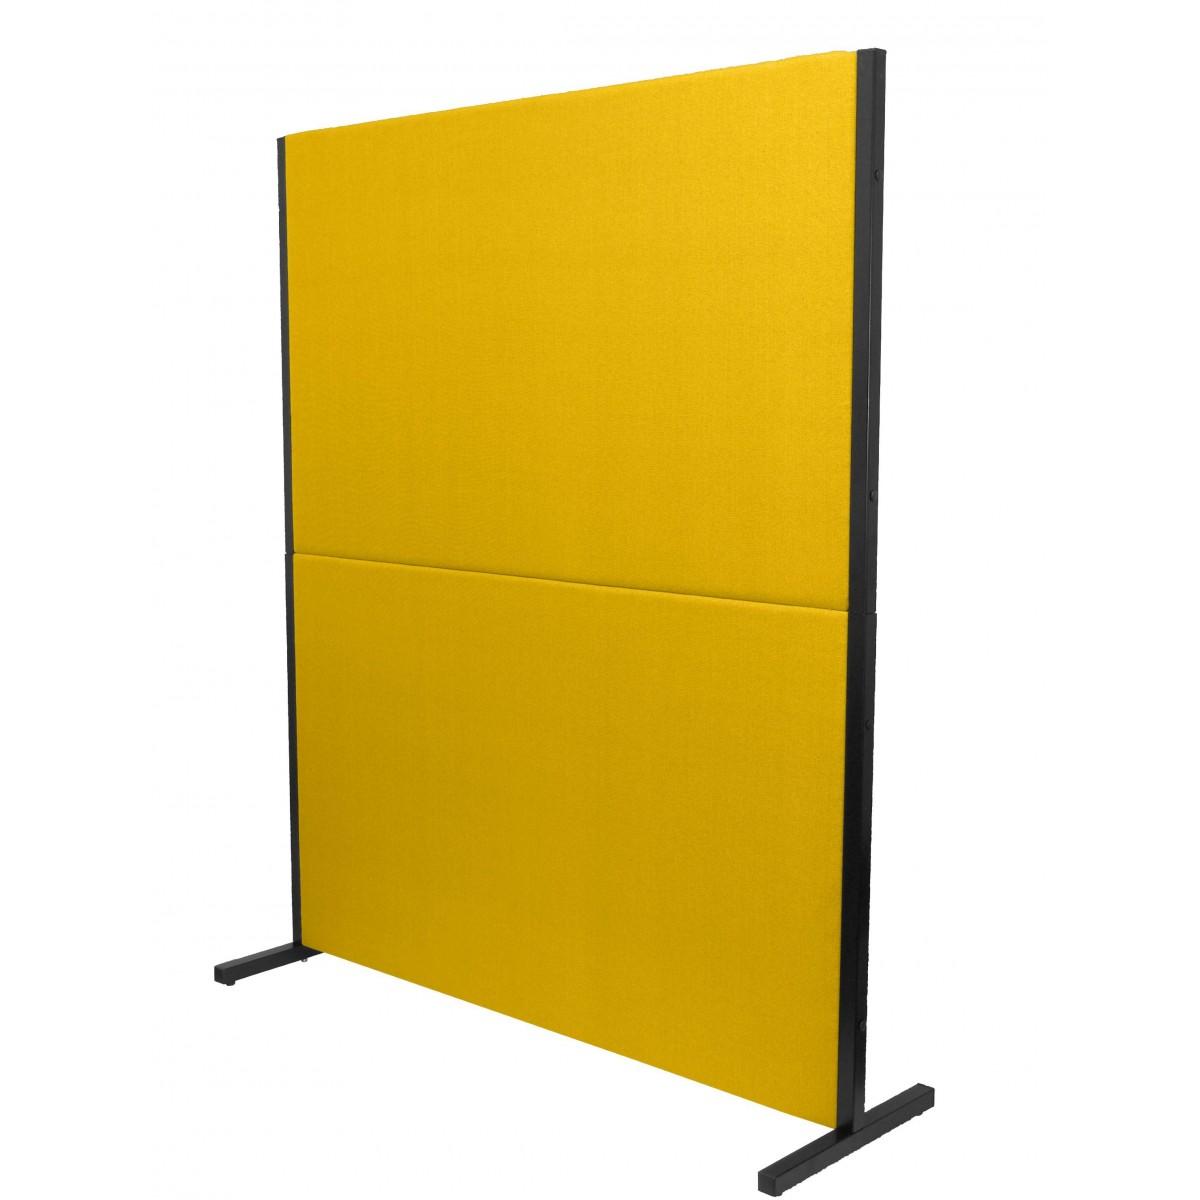 biombo acustico textil amarillo